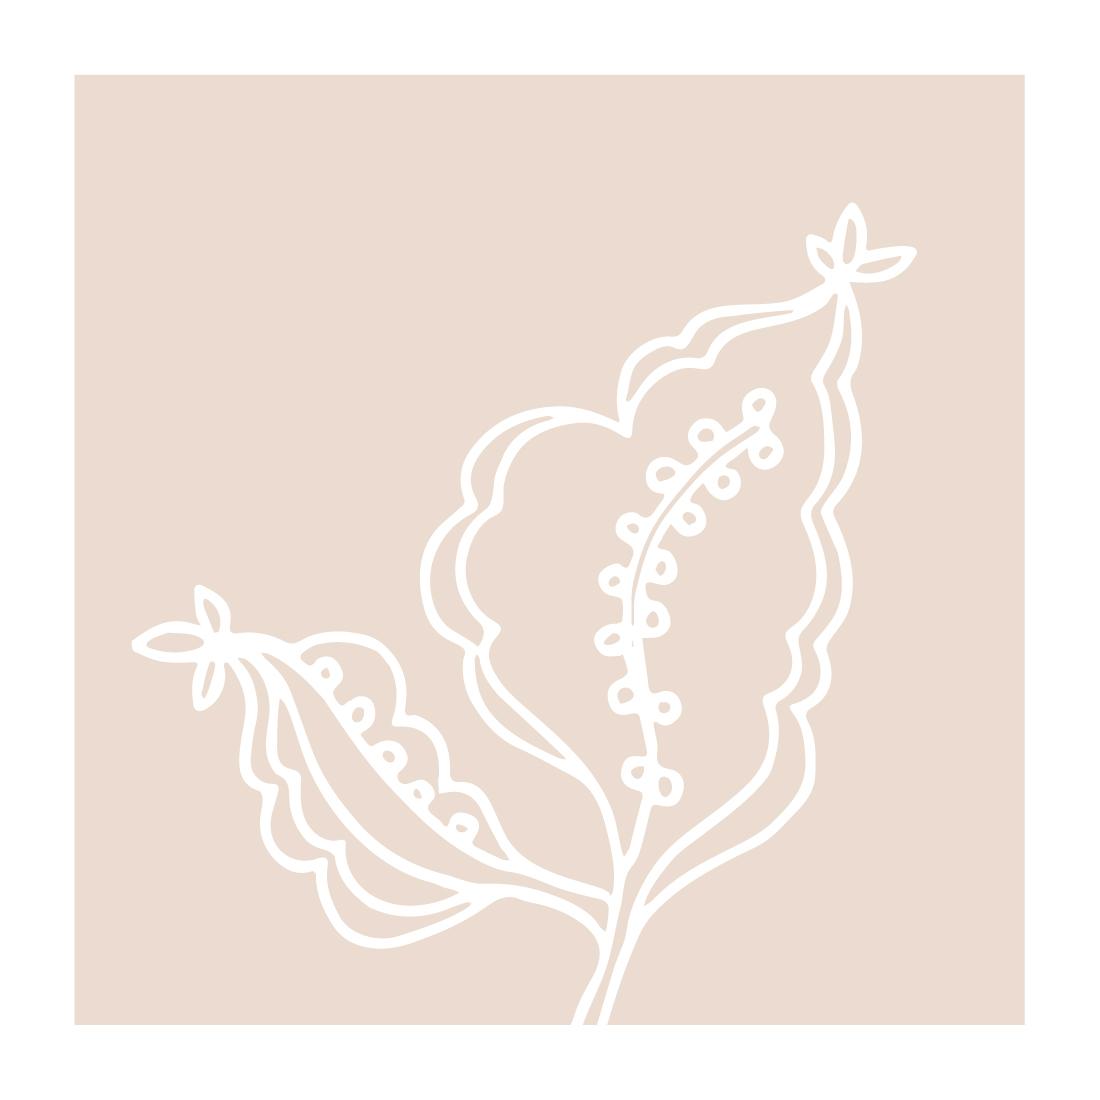 art prints - Simple Garden X by Tanya Lee Design